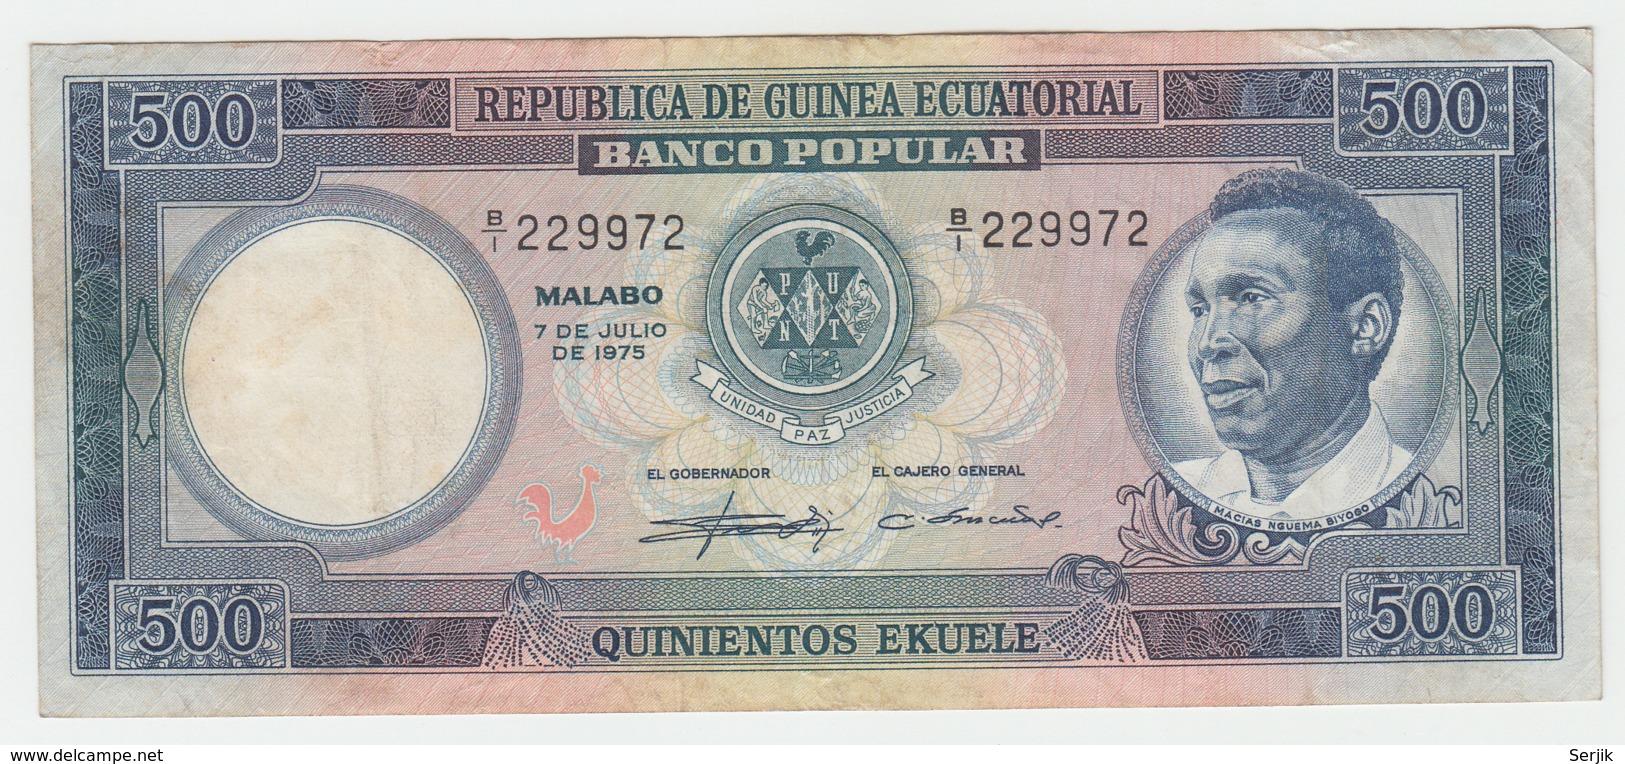 EQUATORIAL GUINEA 500 Ekuele 1975 VF Pick 7 - Guinea